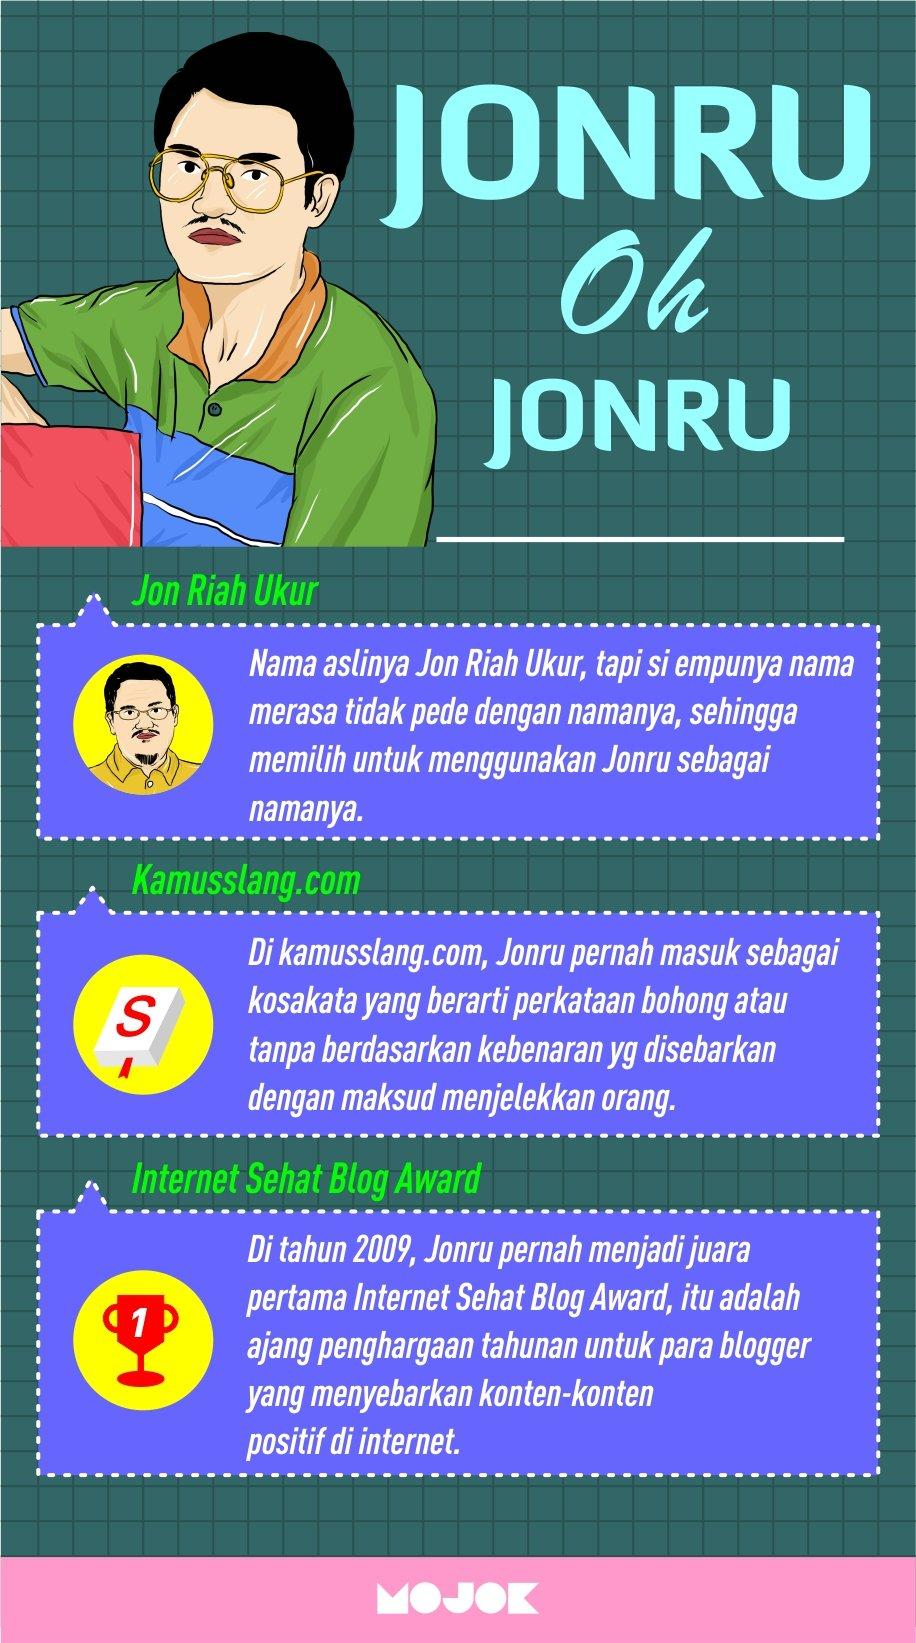 Jonru